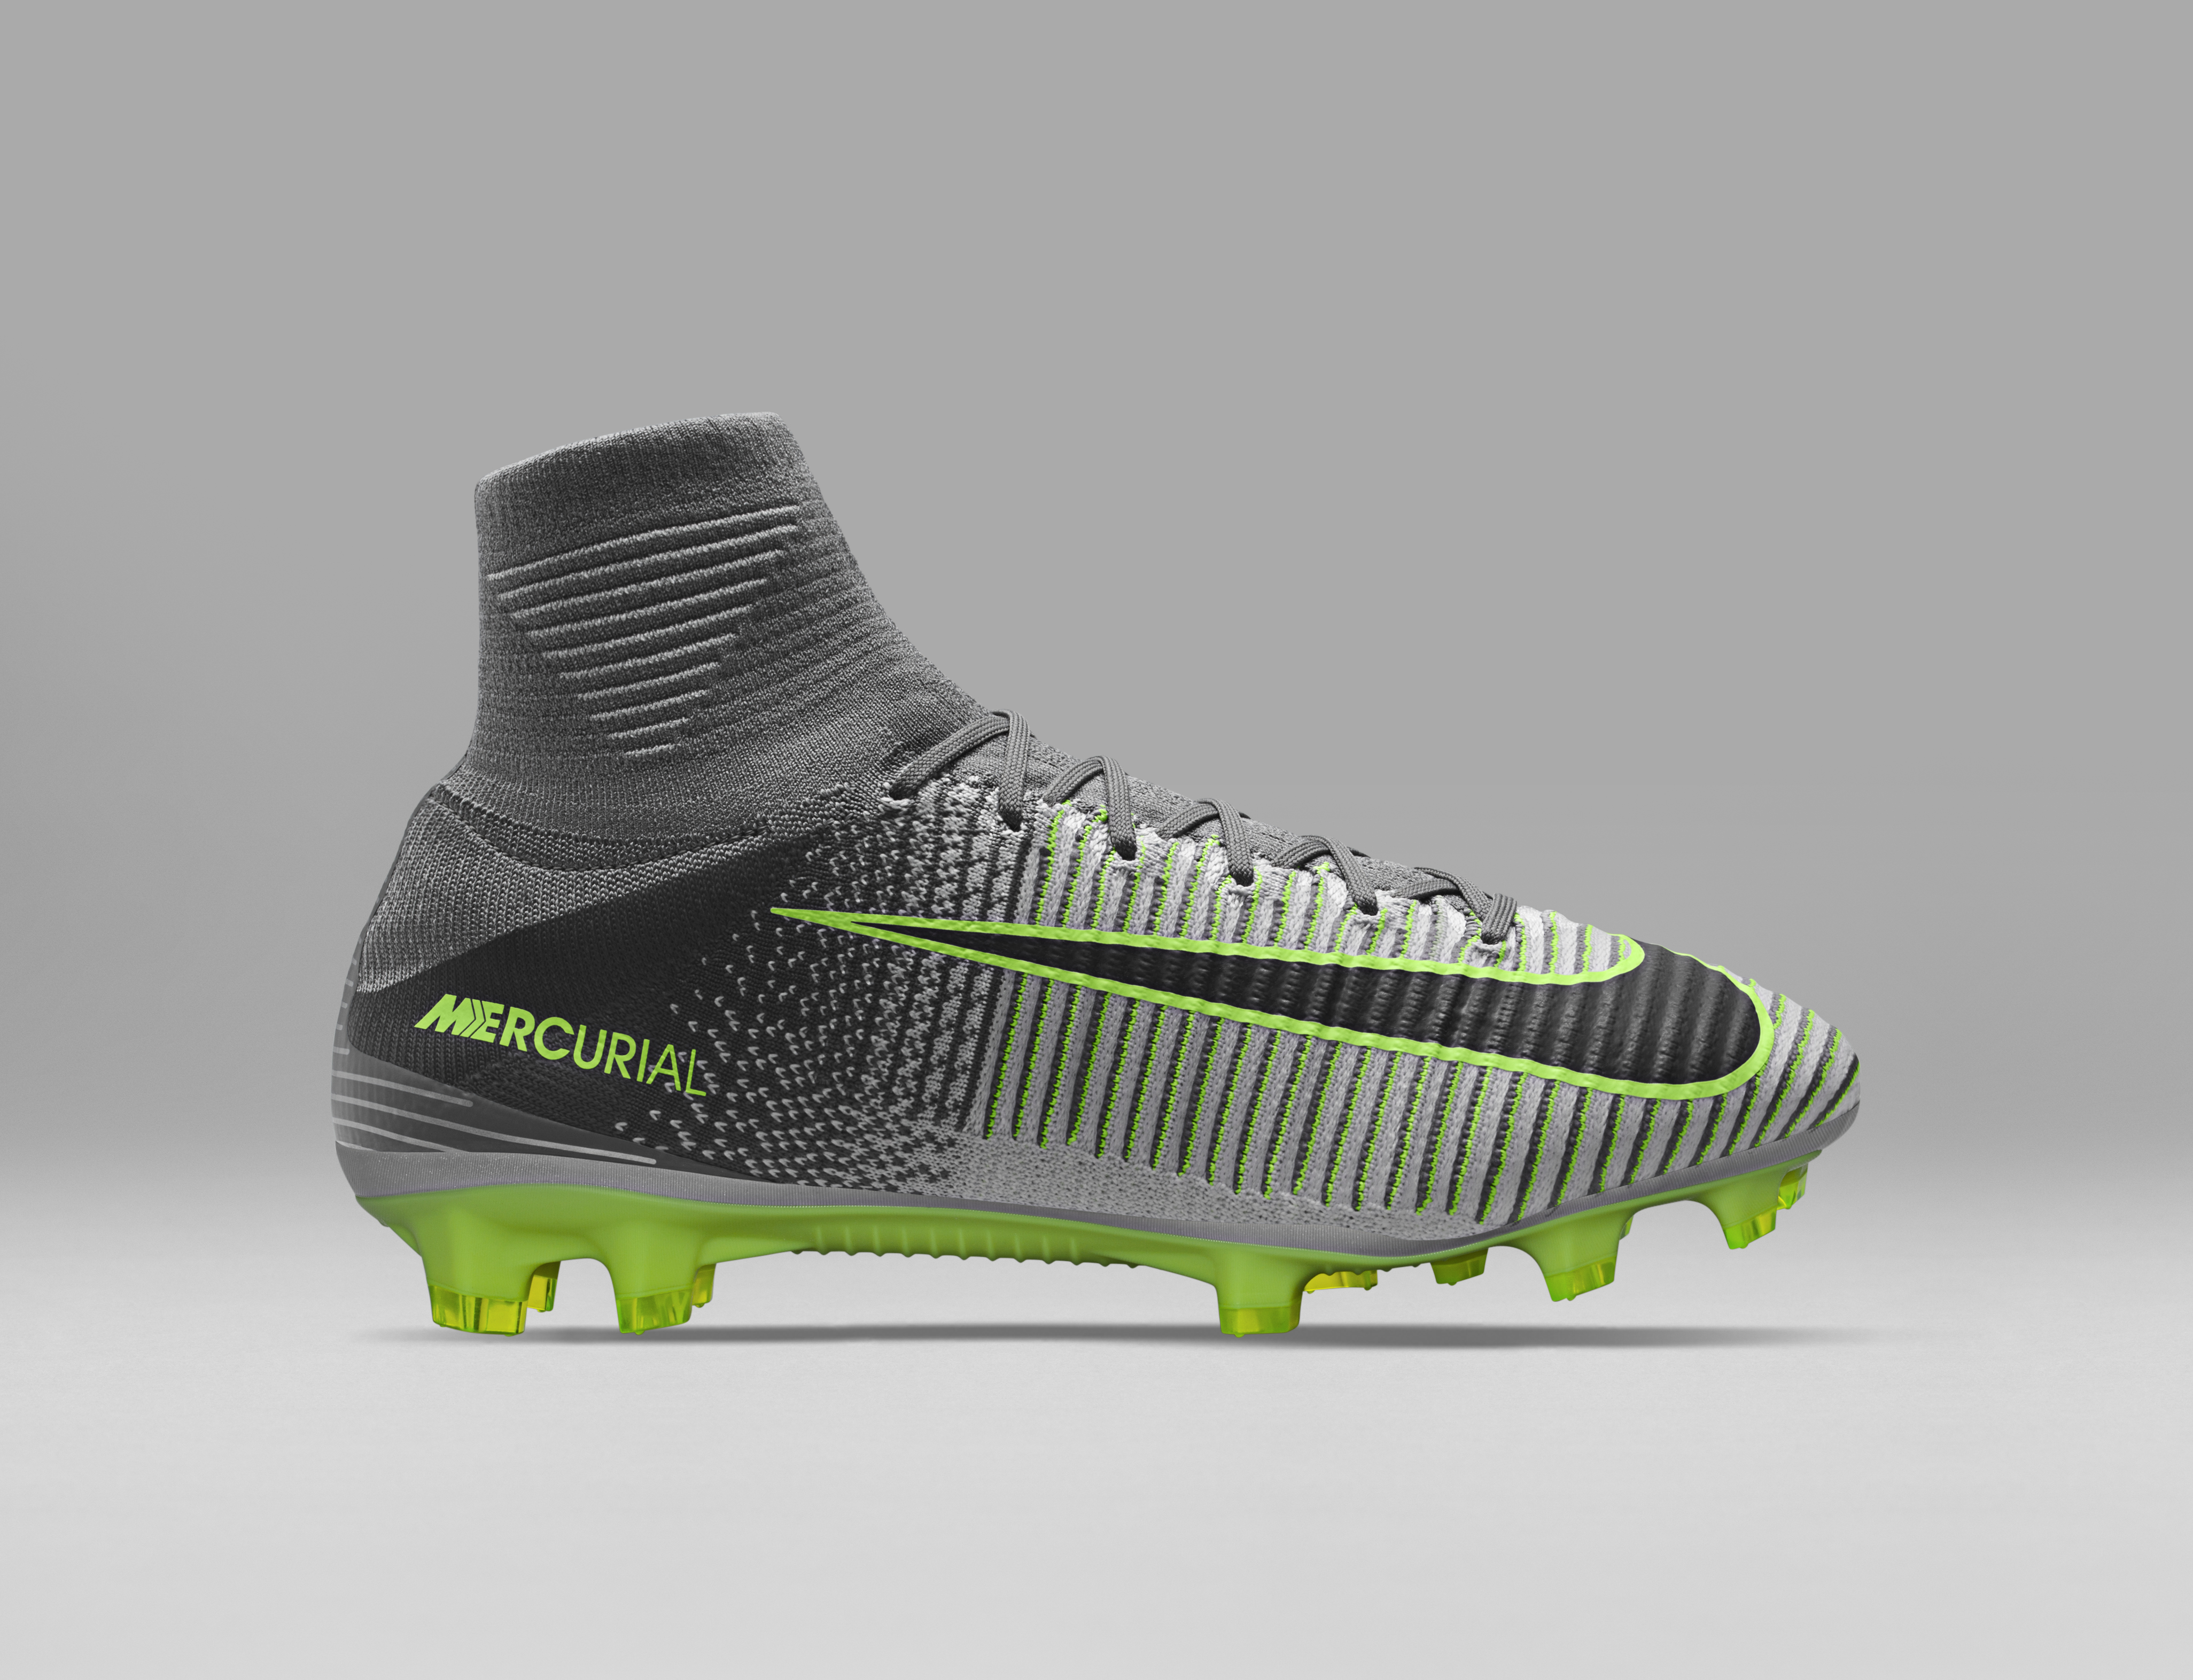 Nike Mercurial Superfly Elite Pack. Nike Hypervenom Phantom Elite Pack. Nike  Tiempo Elite Pack. Le nuove scarpe da calcio ... 2e2f21d275b